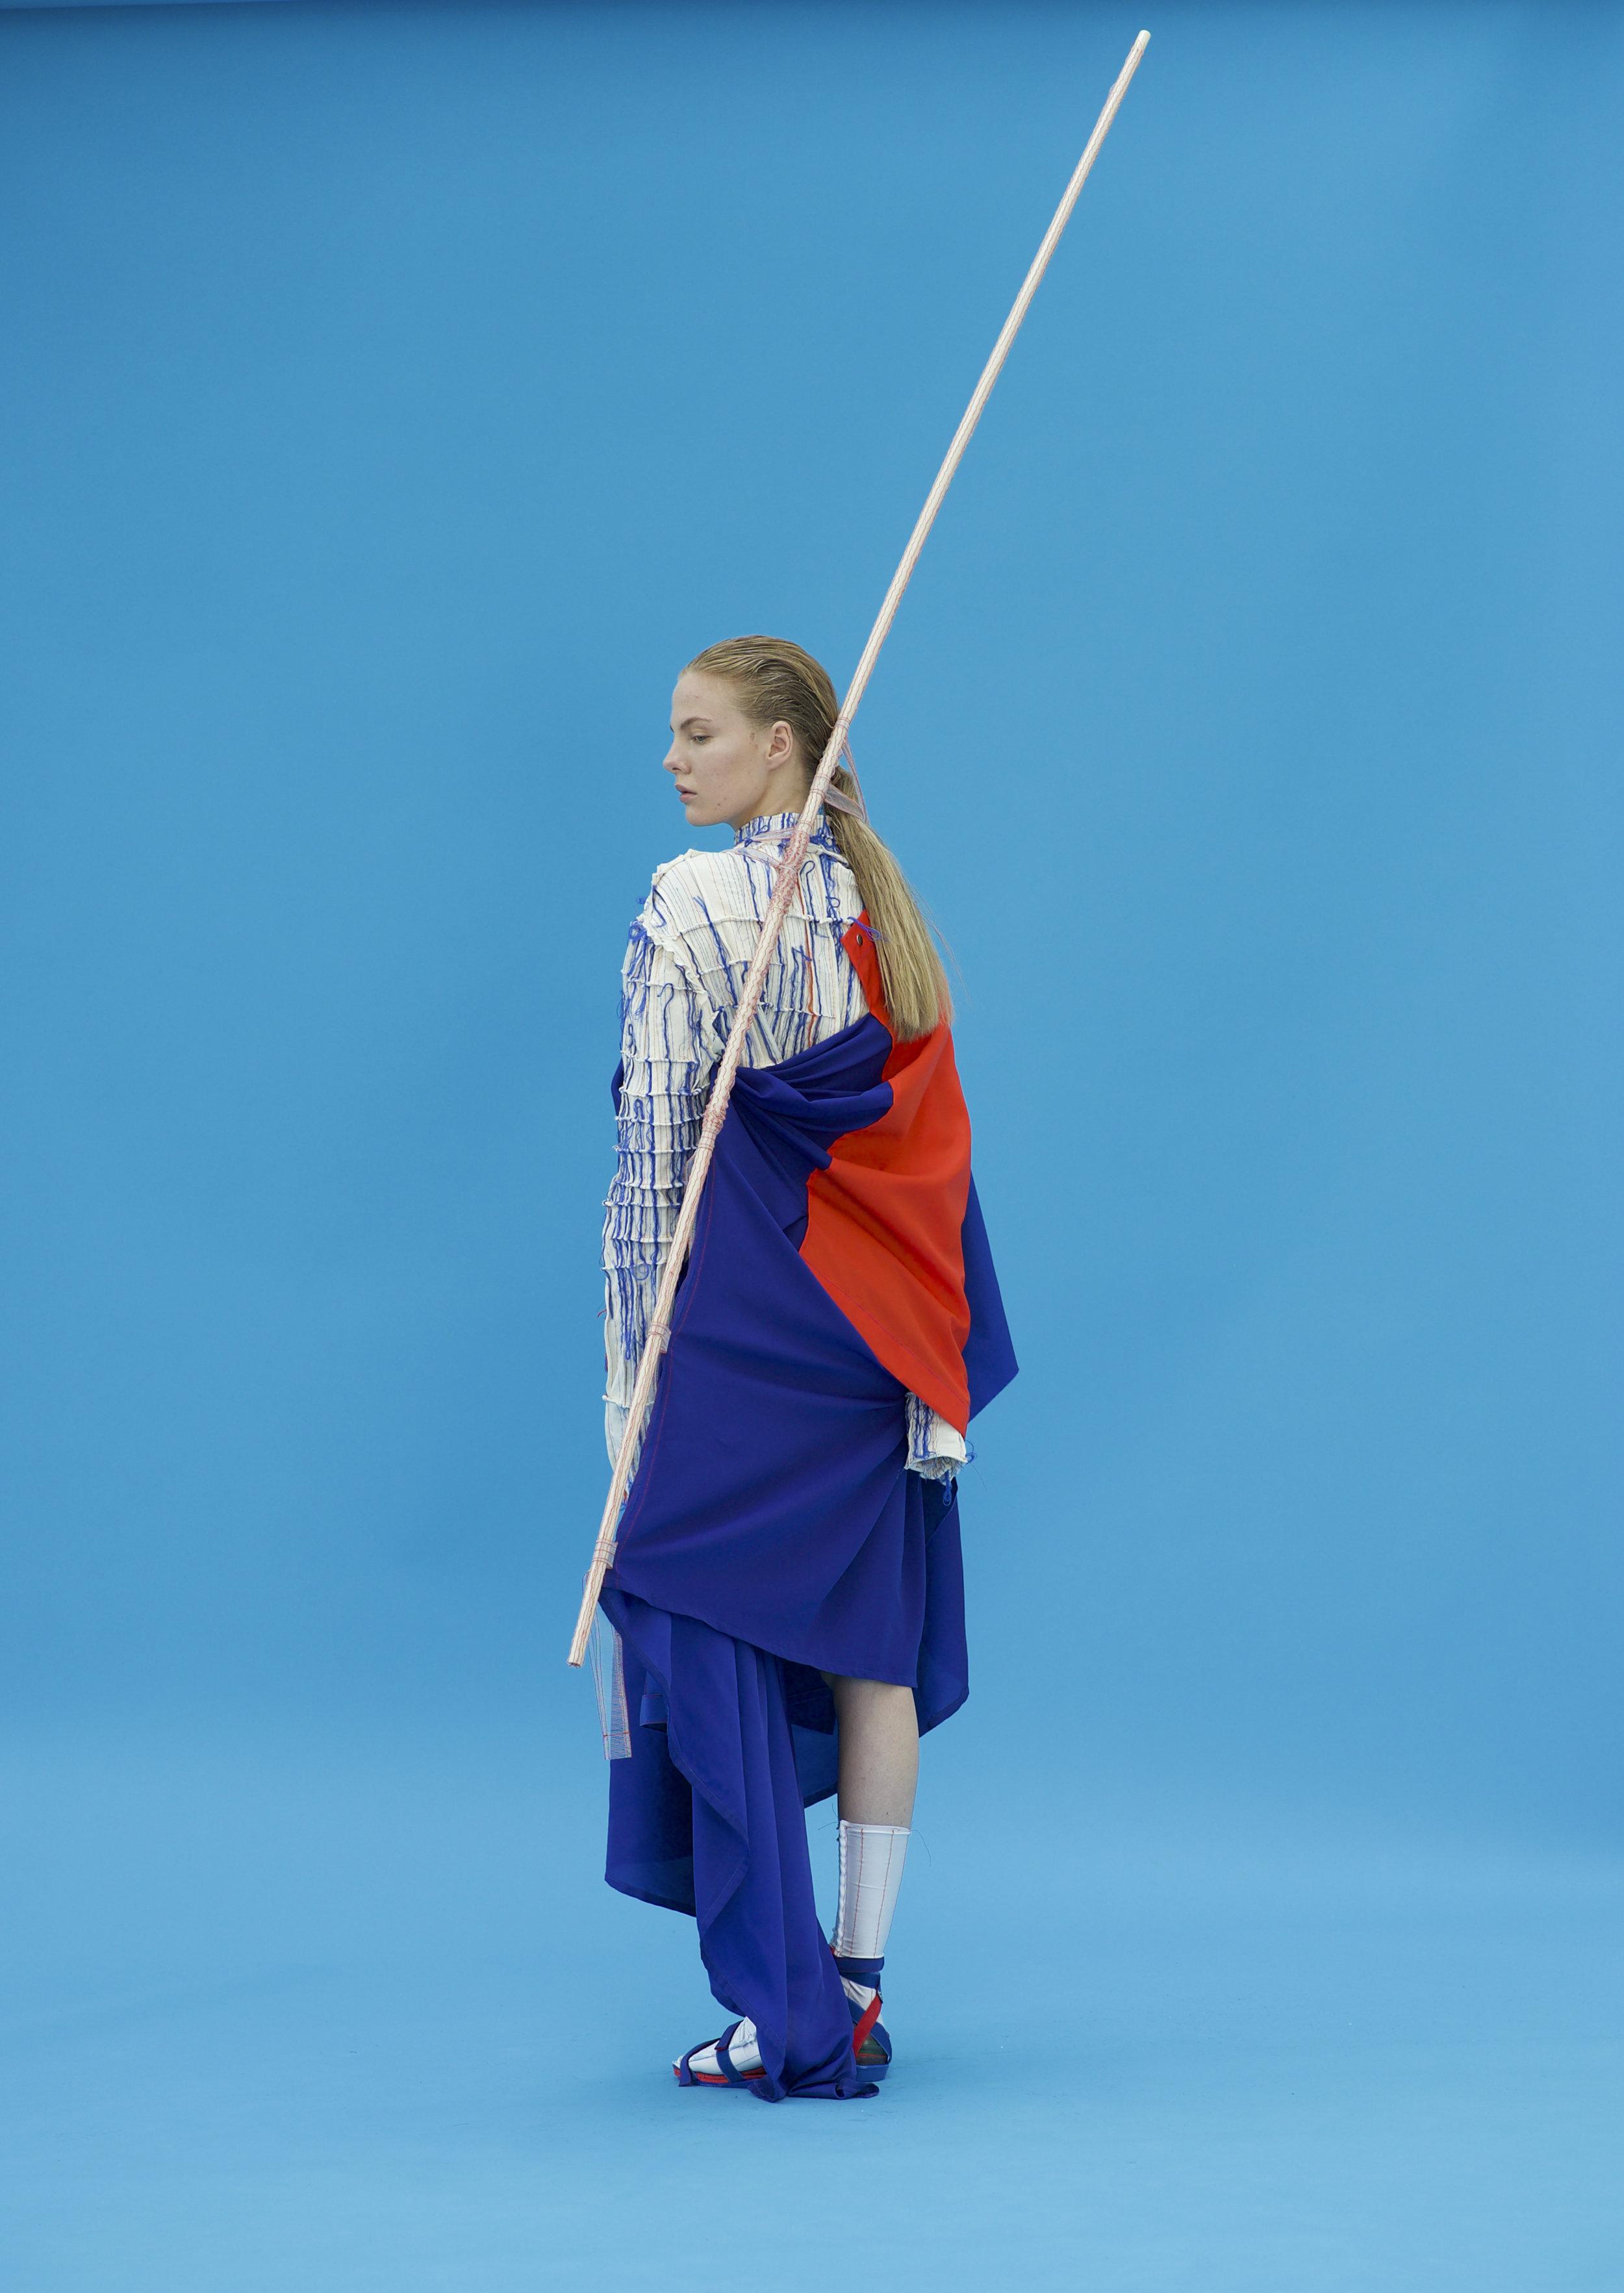 MAFashion_HelgaLaraHalldorsdottir_Outfit8.jpg